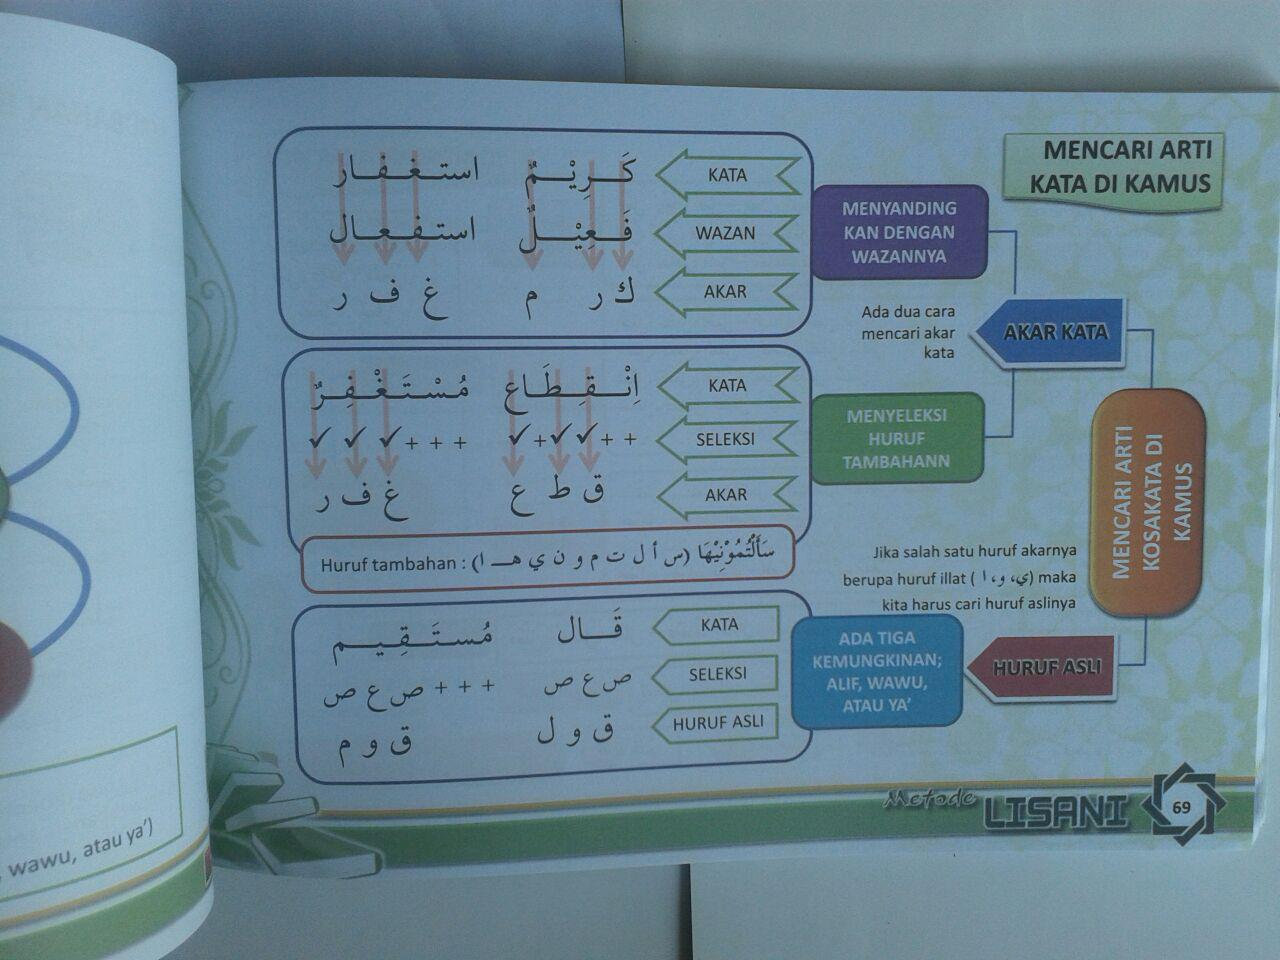 Buku 4 Langkah Tepat Membaca Kitab Arab Metode Lisani isi 3